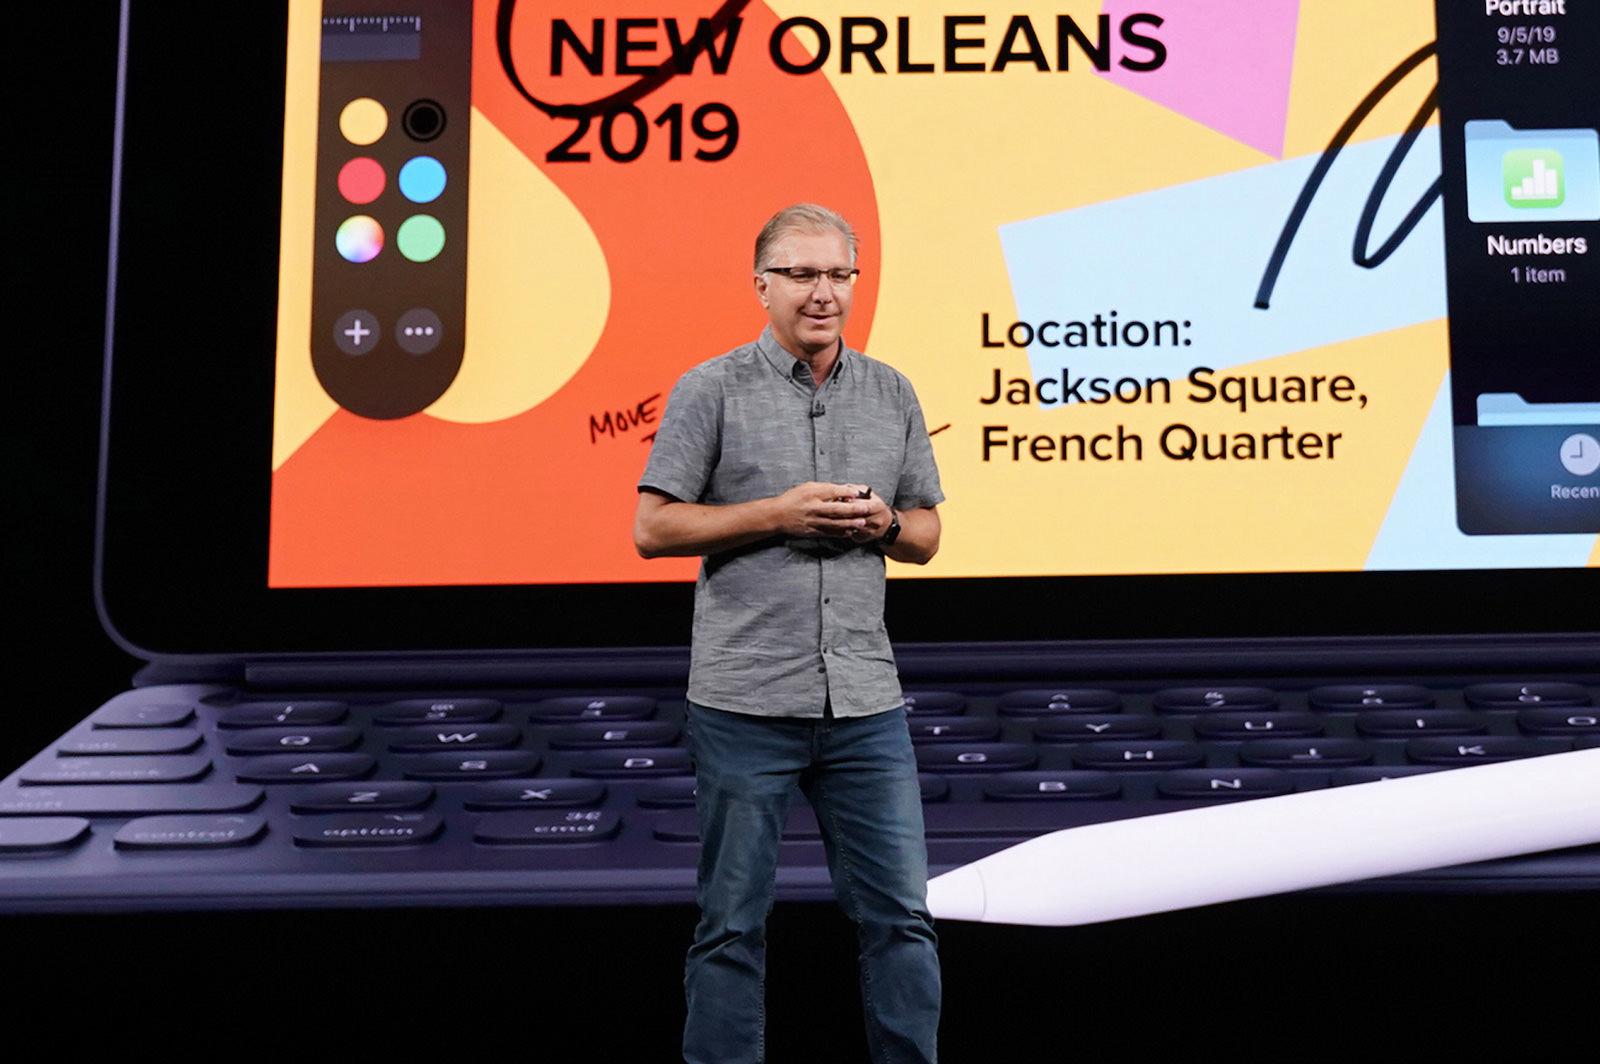 Greg-Joswiak-joins-apple-executive-team-svp-of-worldwide-marketing_08042020.jpg